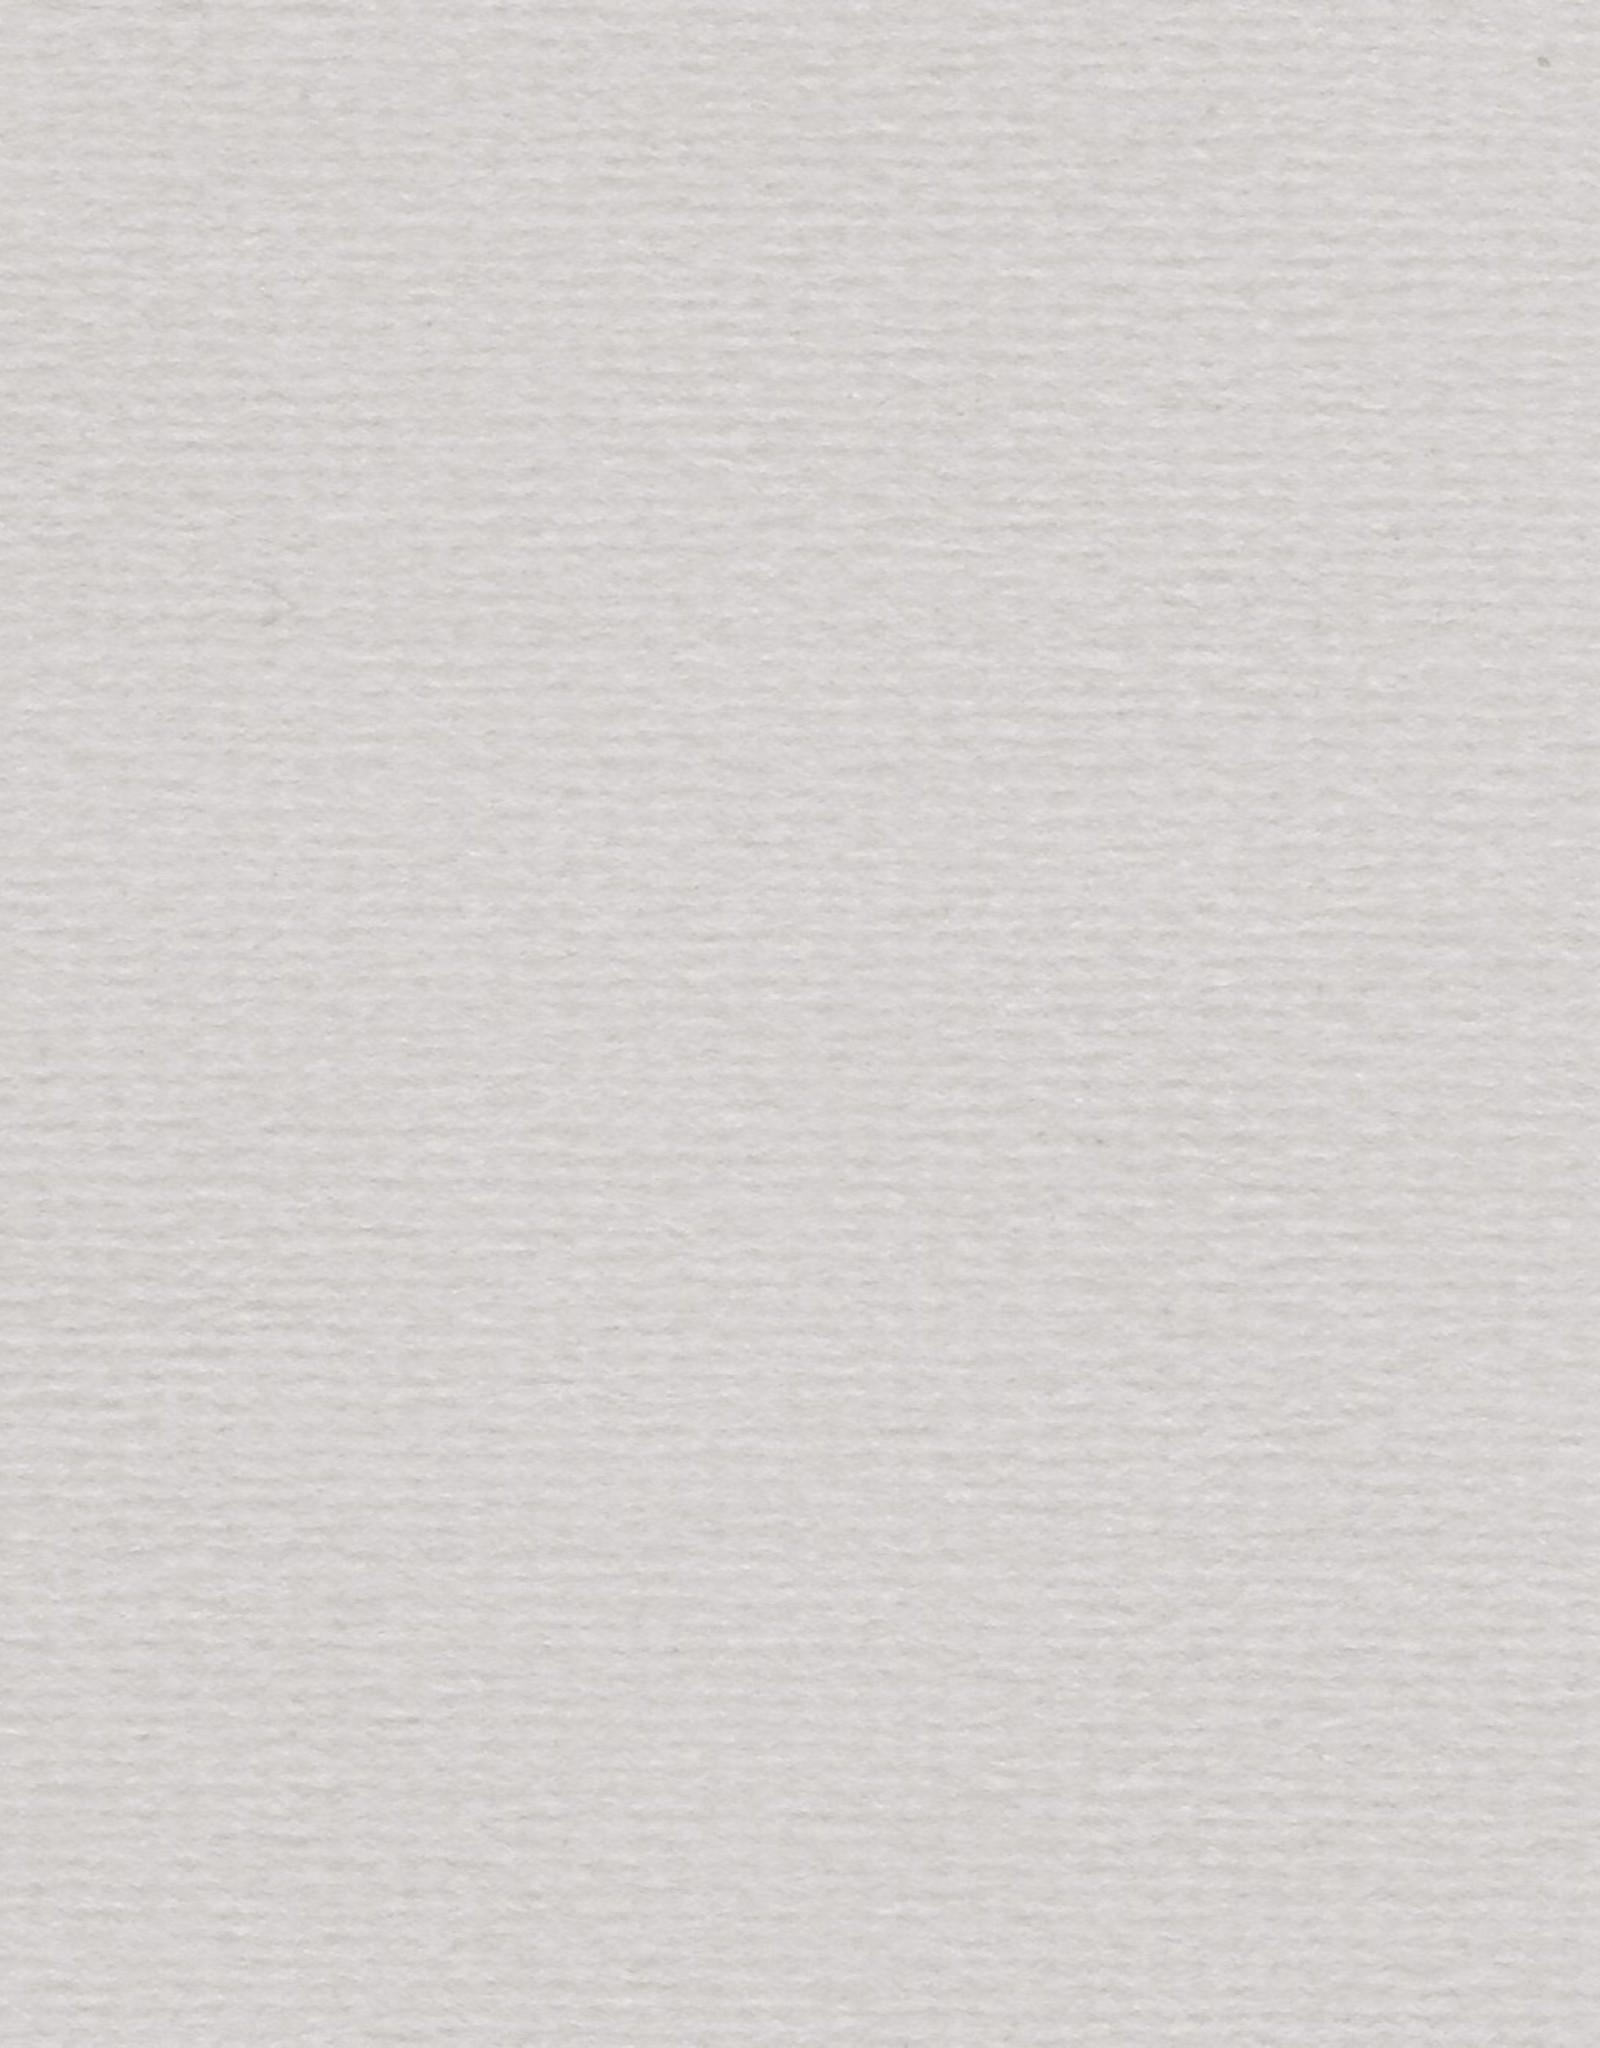 "Hahnemuhle Bugra, Marble Grey #317, 33"" x 41"" 130 gsm"